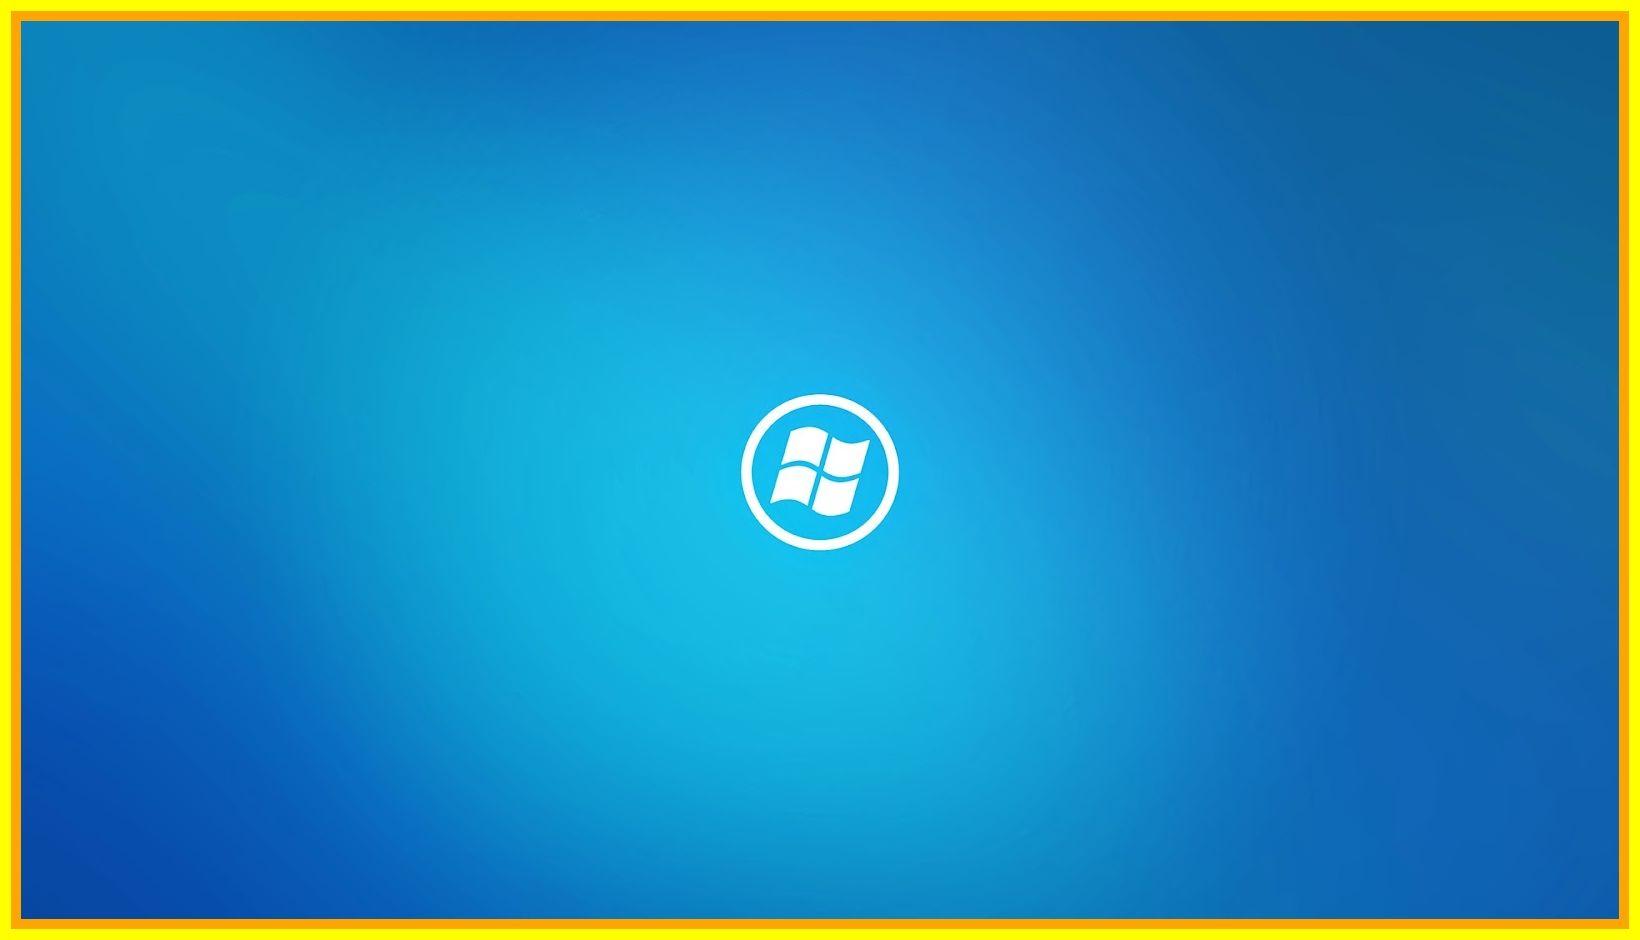 34 Reference Of Desktop Decoration Software For Windows 7 In 2020 Windows Desktop Wallpaper Windows Wallpaper Microsoft Wallpaper